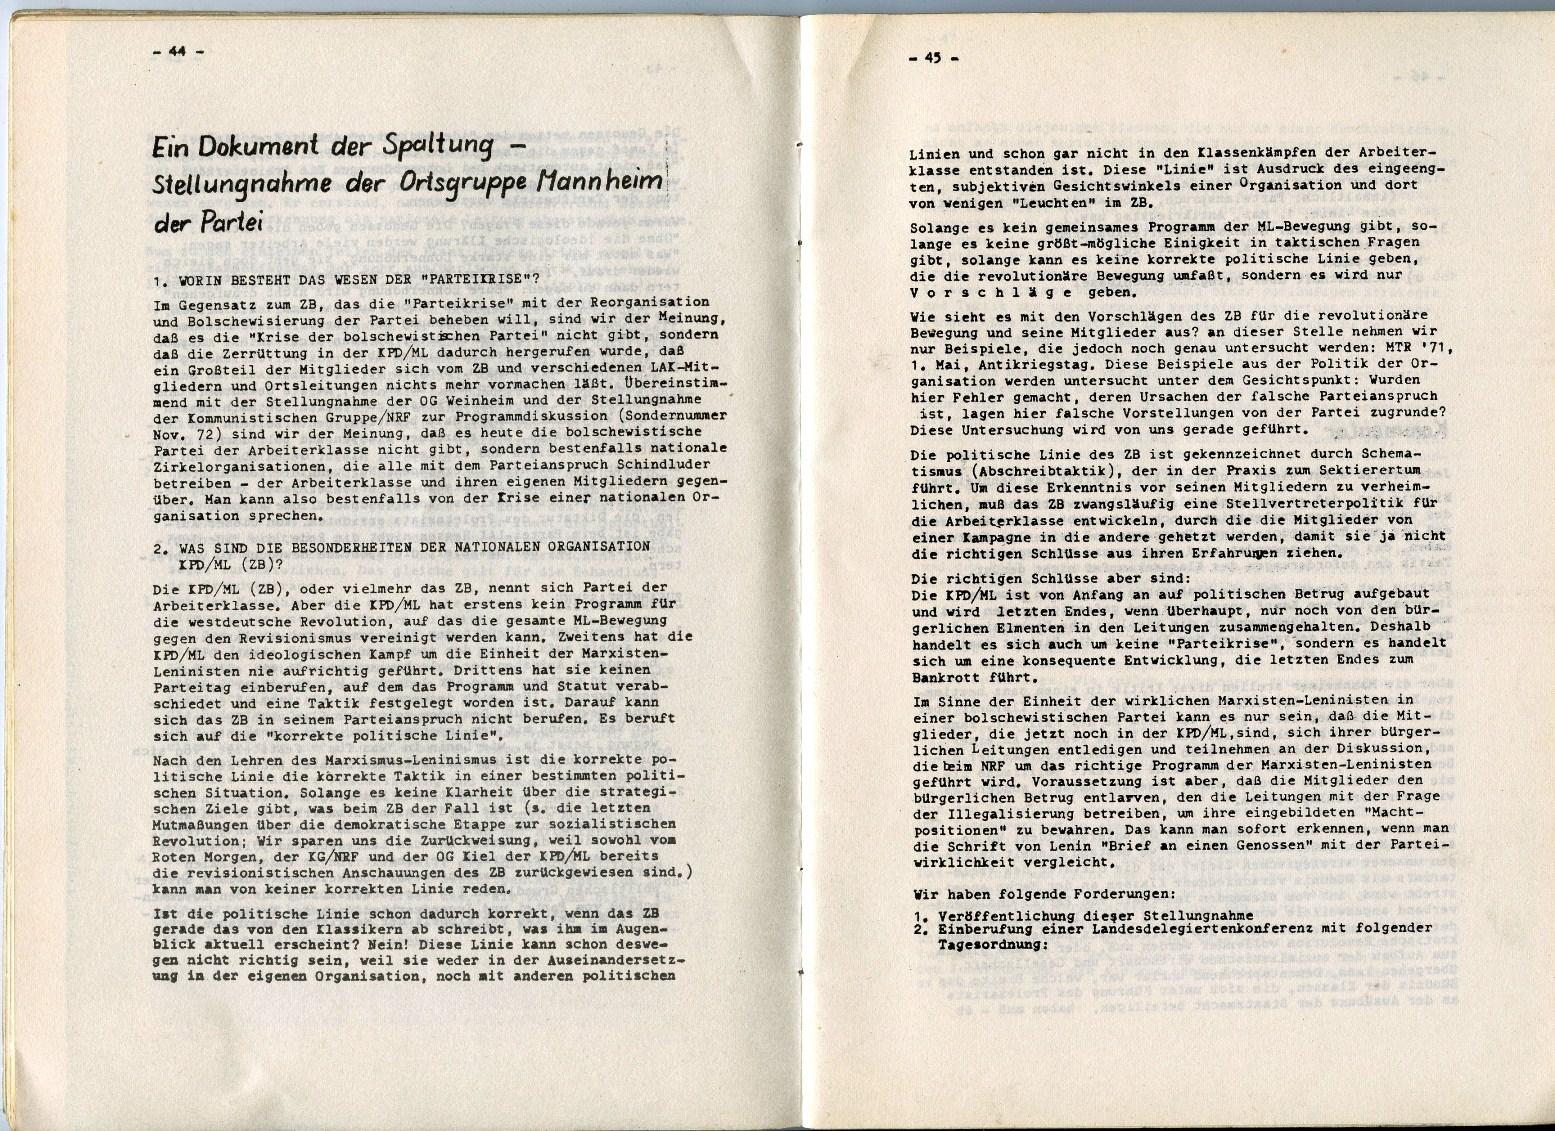 ZB_Universitas_1972_26